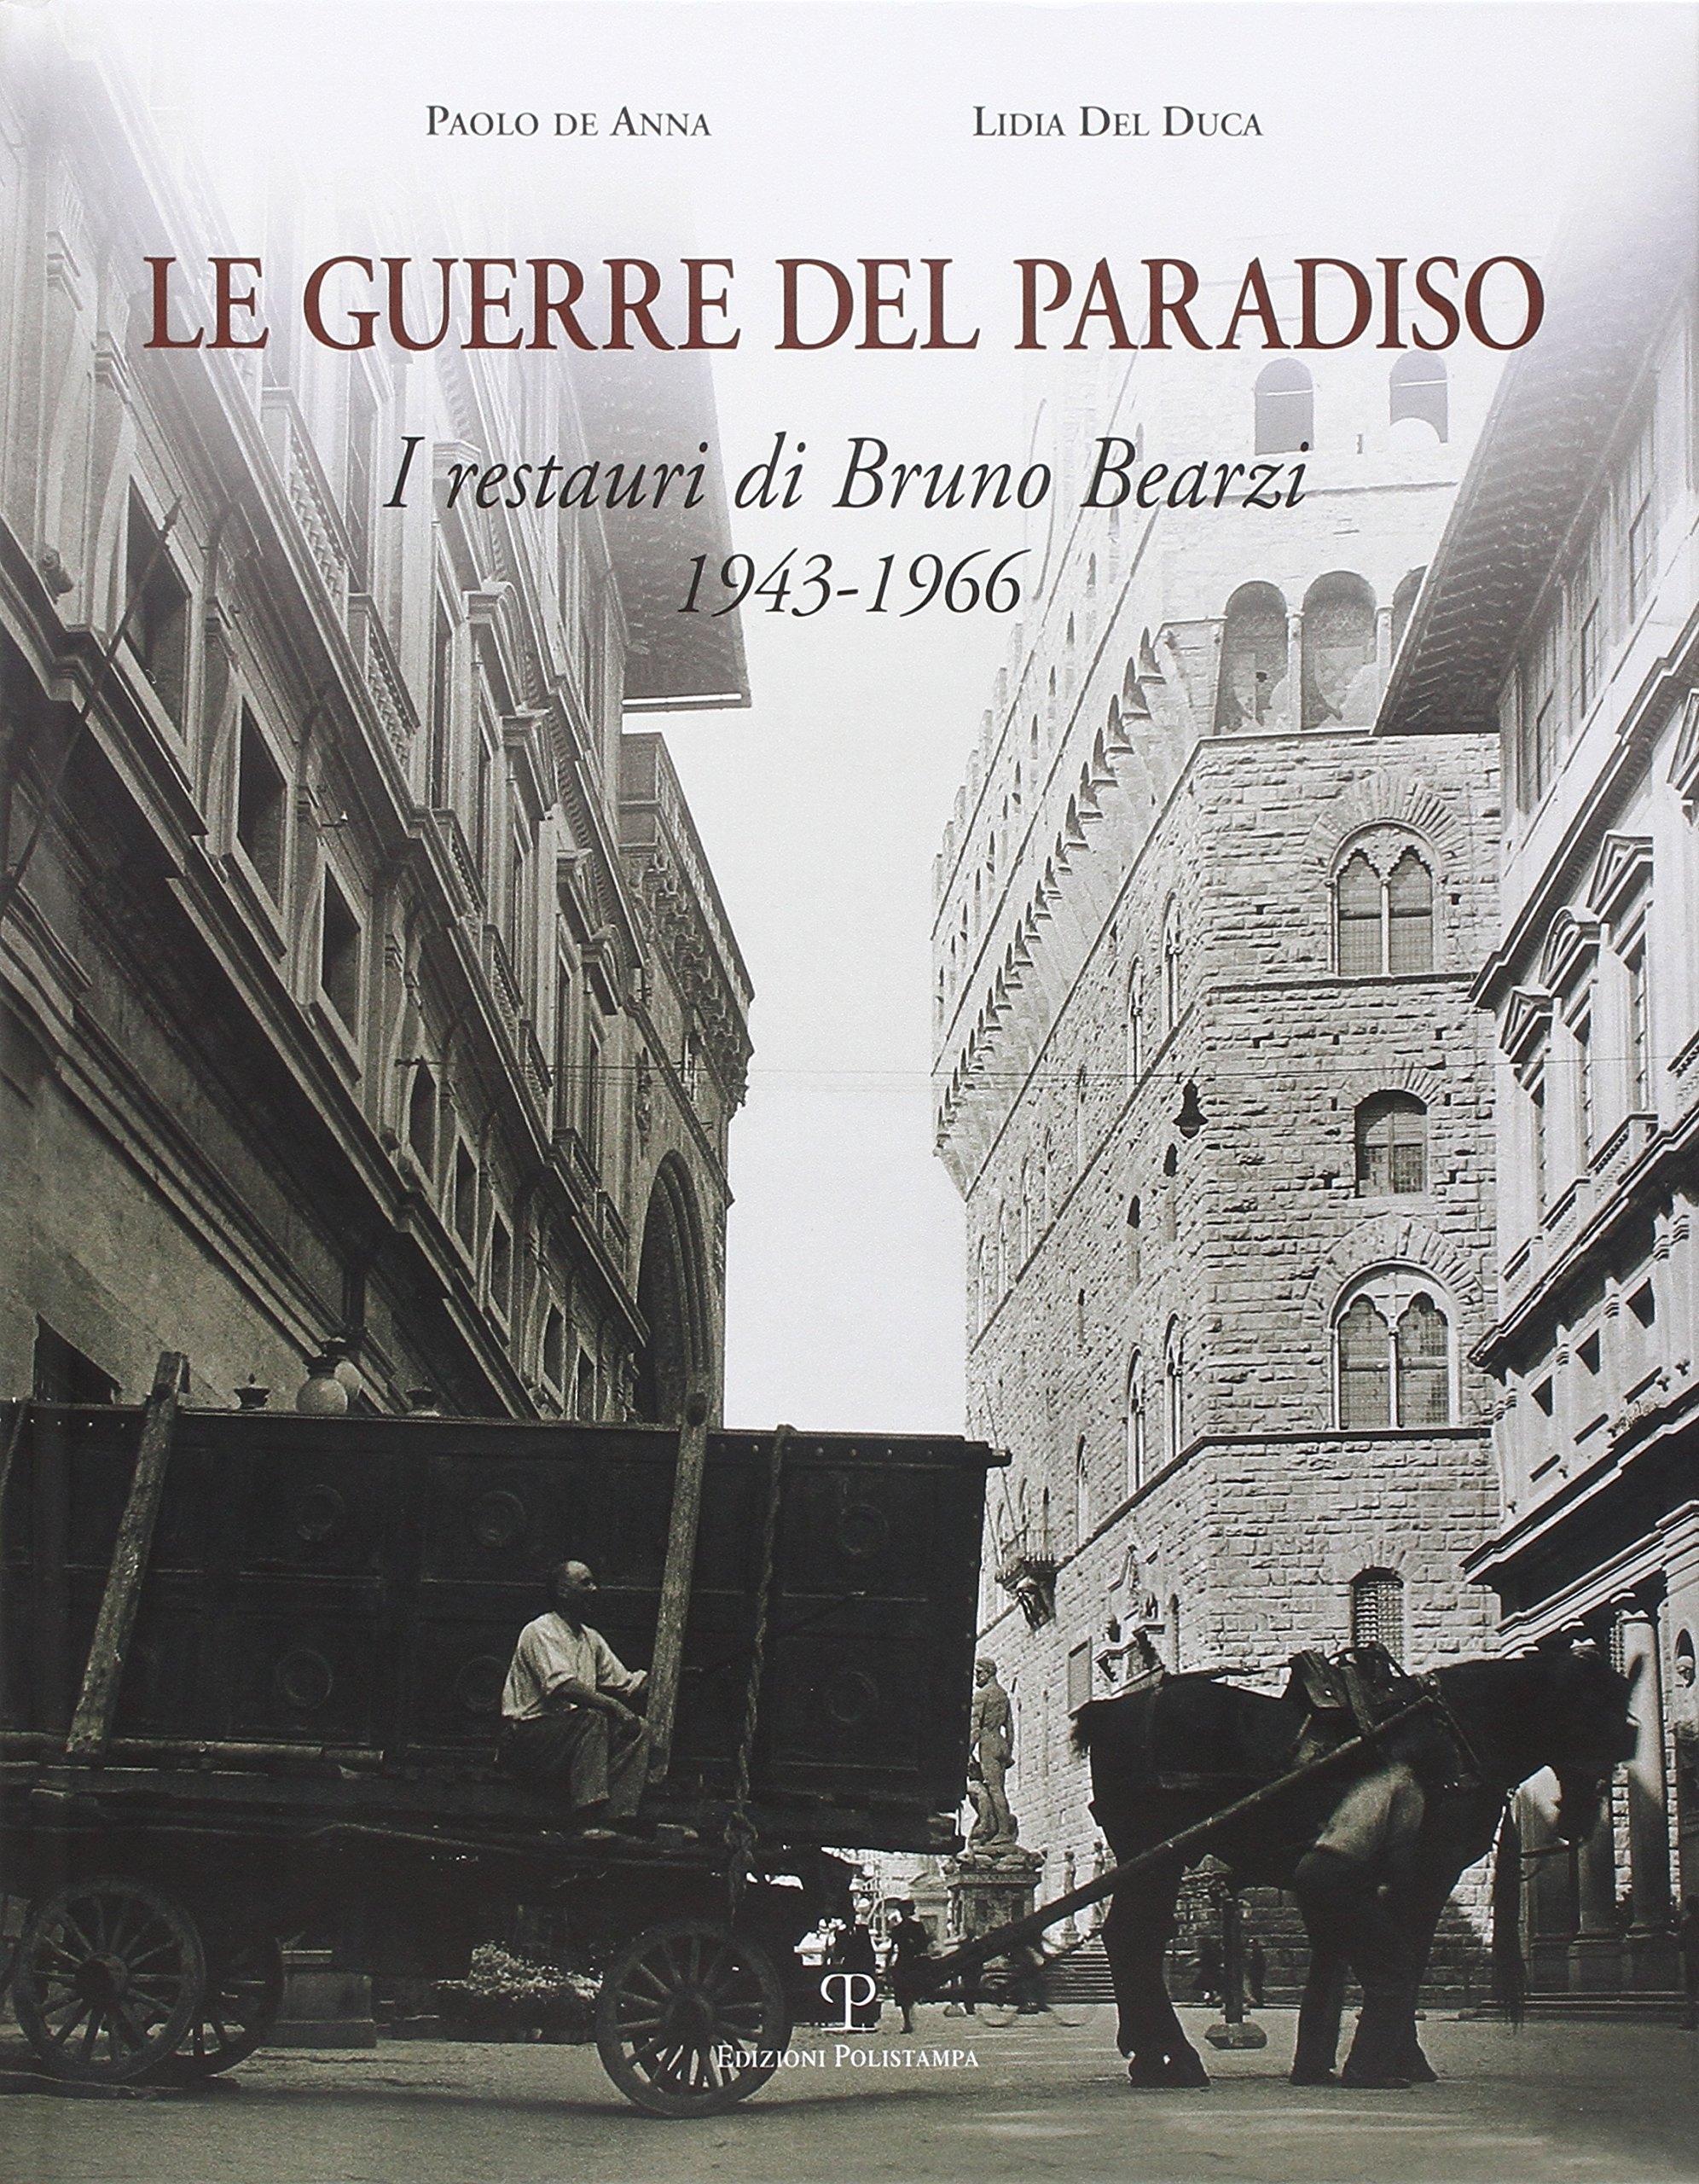 Le guerre del paradiso. Bruno Bearzi 1943-1966.